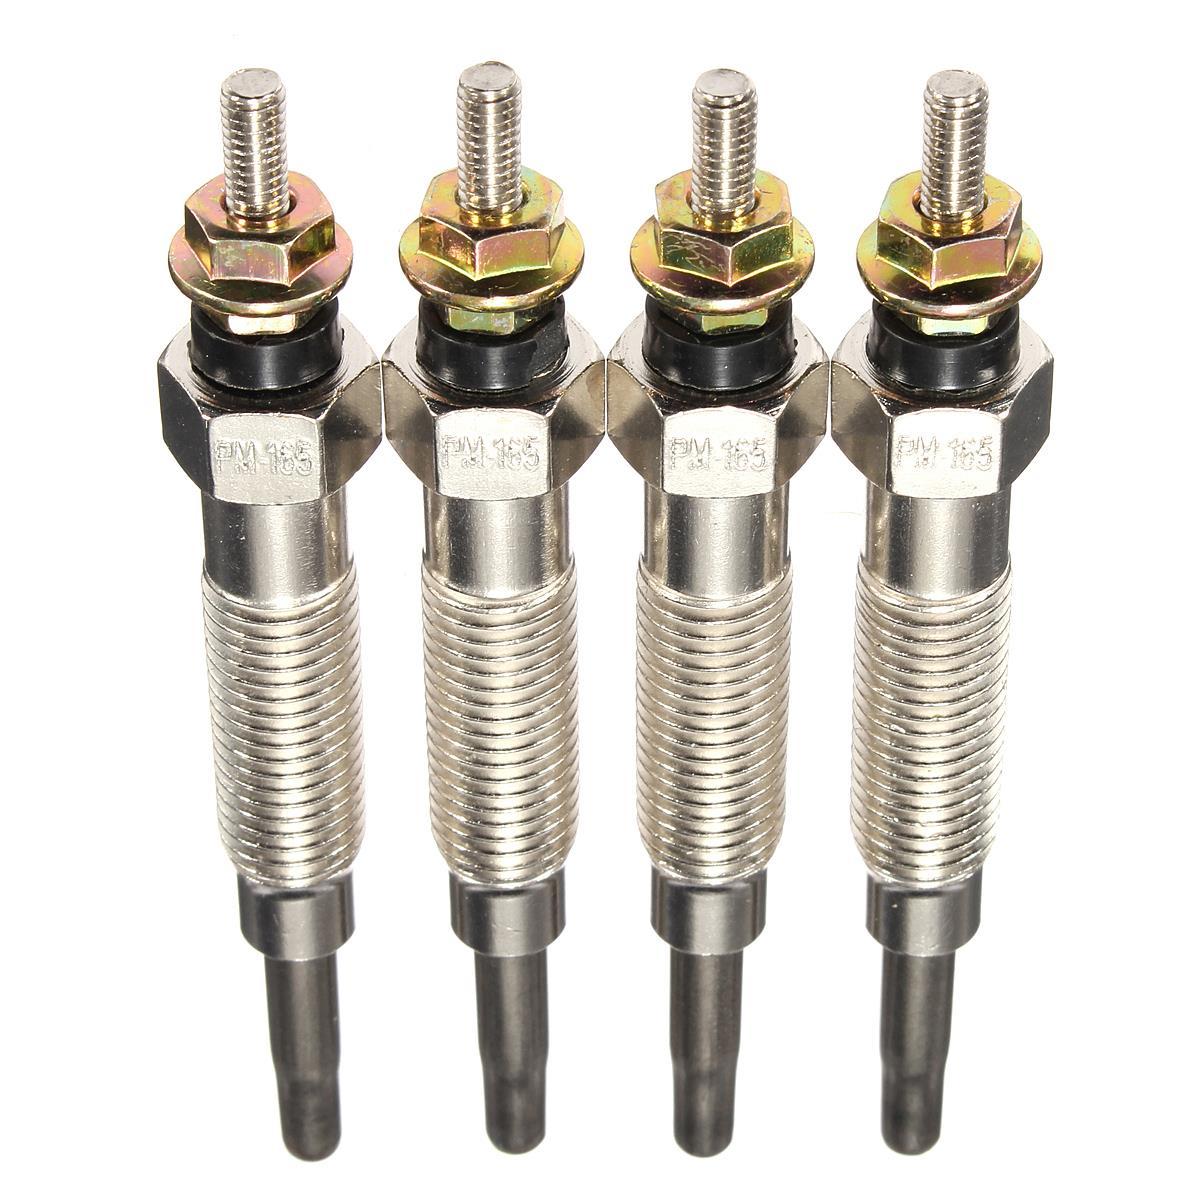 4 Pcs/Set Heater Glow Plugs For Mitsubishi /SHOGUN /PAJERO /2.8 /4M40T /4M40 /GP5501